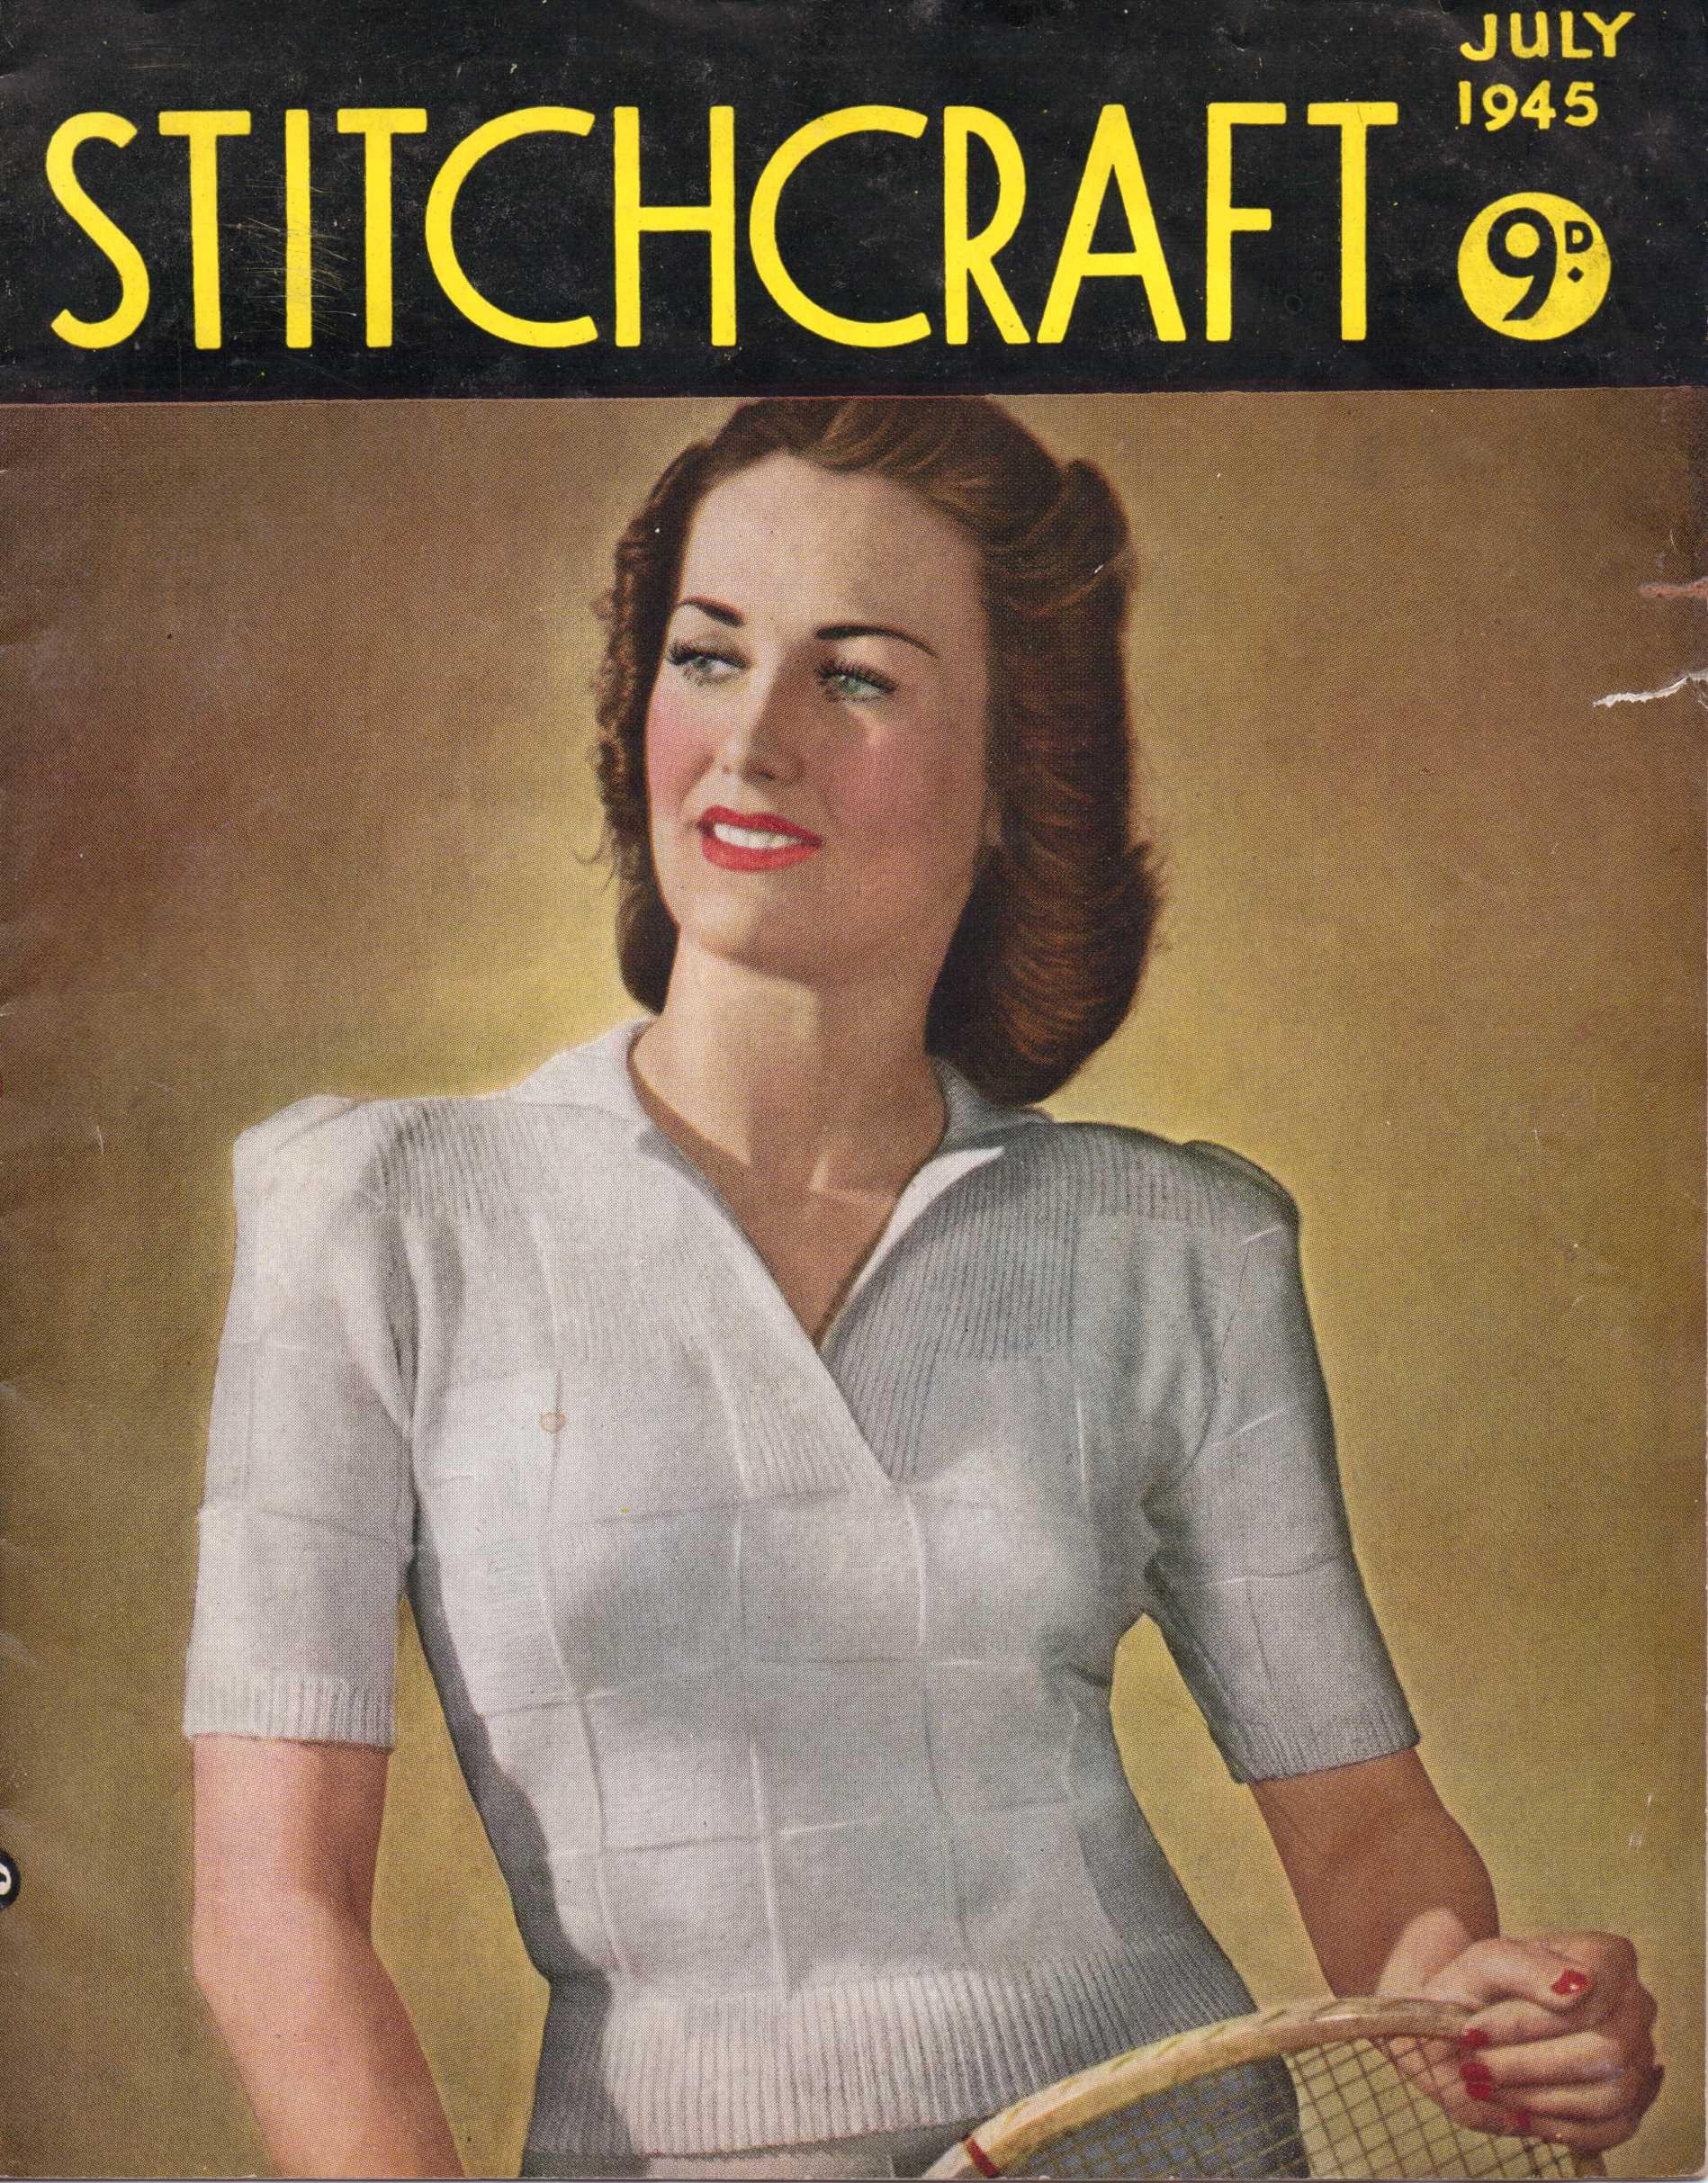 Free Vintage Magazine: Stitchcraft July 1945